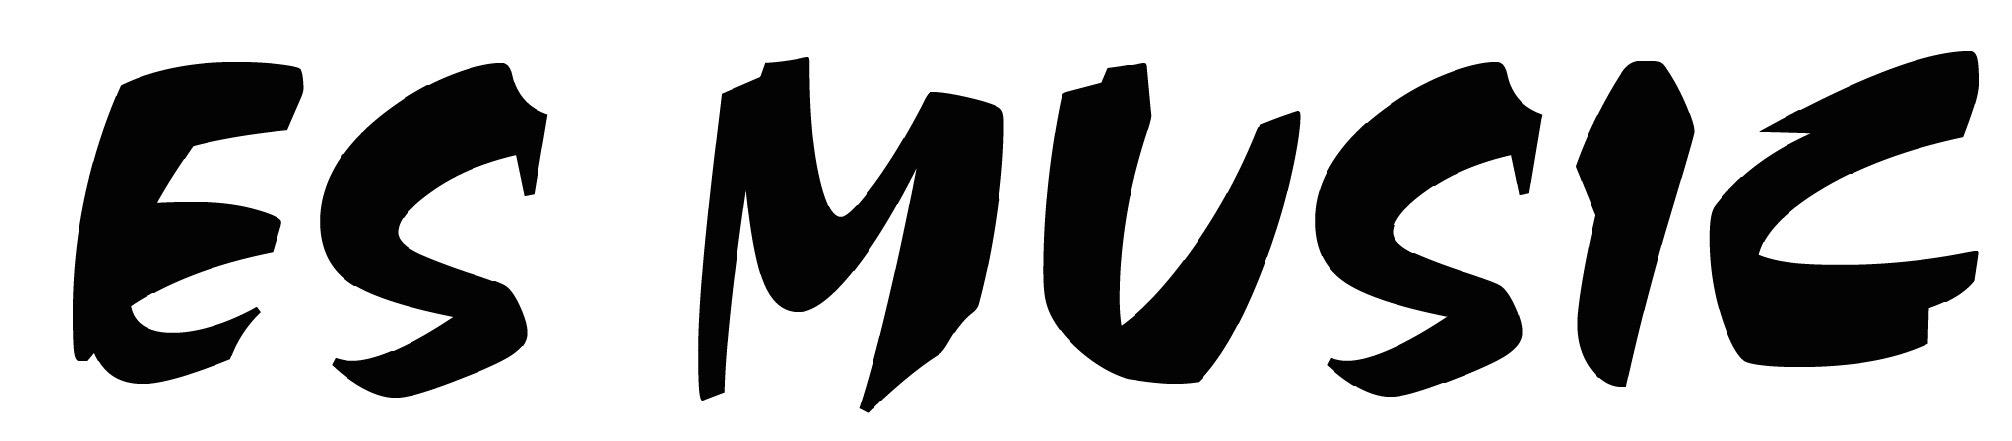 esmusic.org